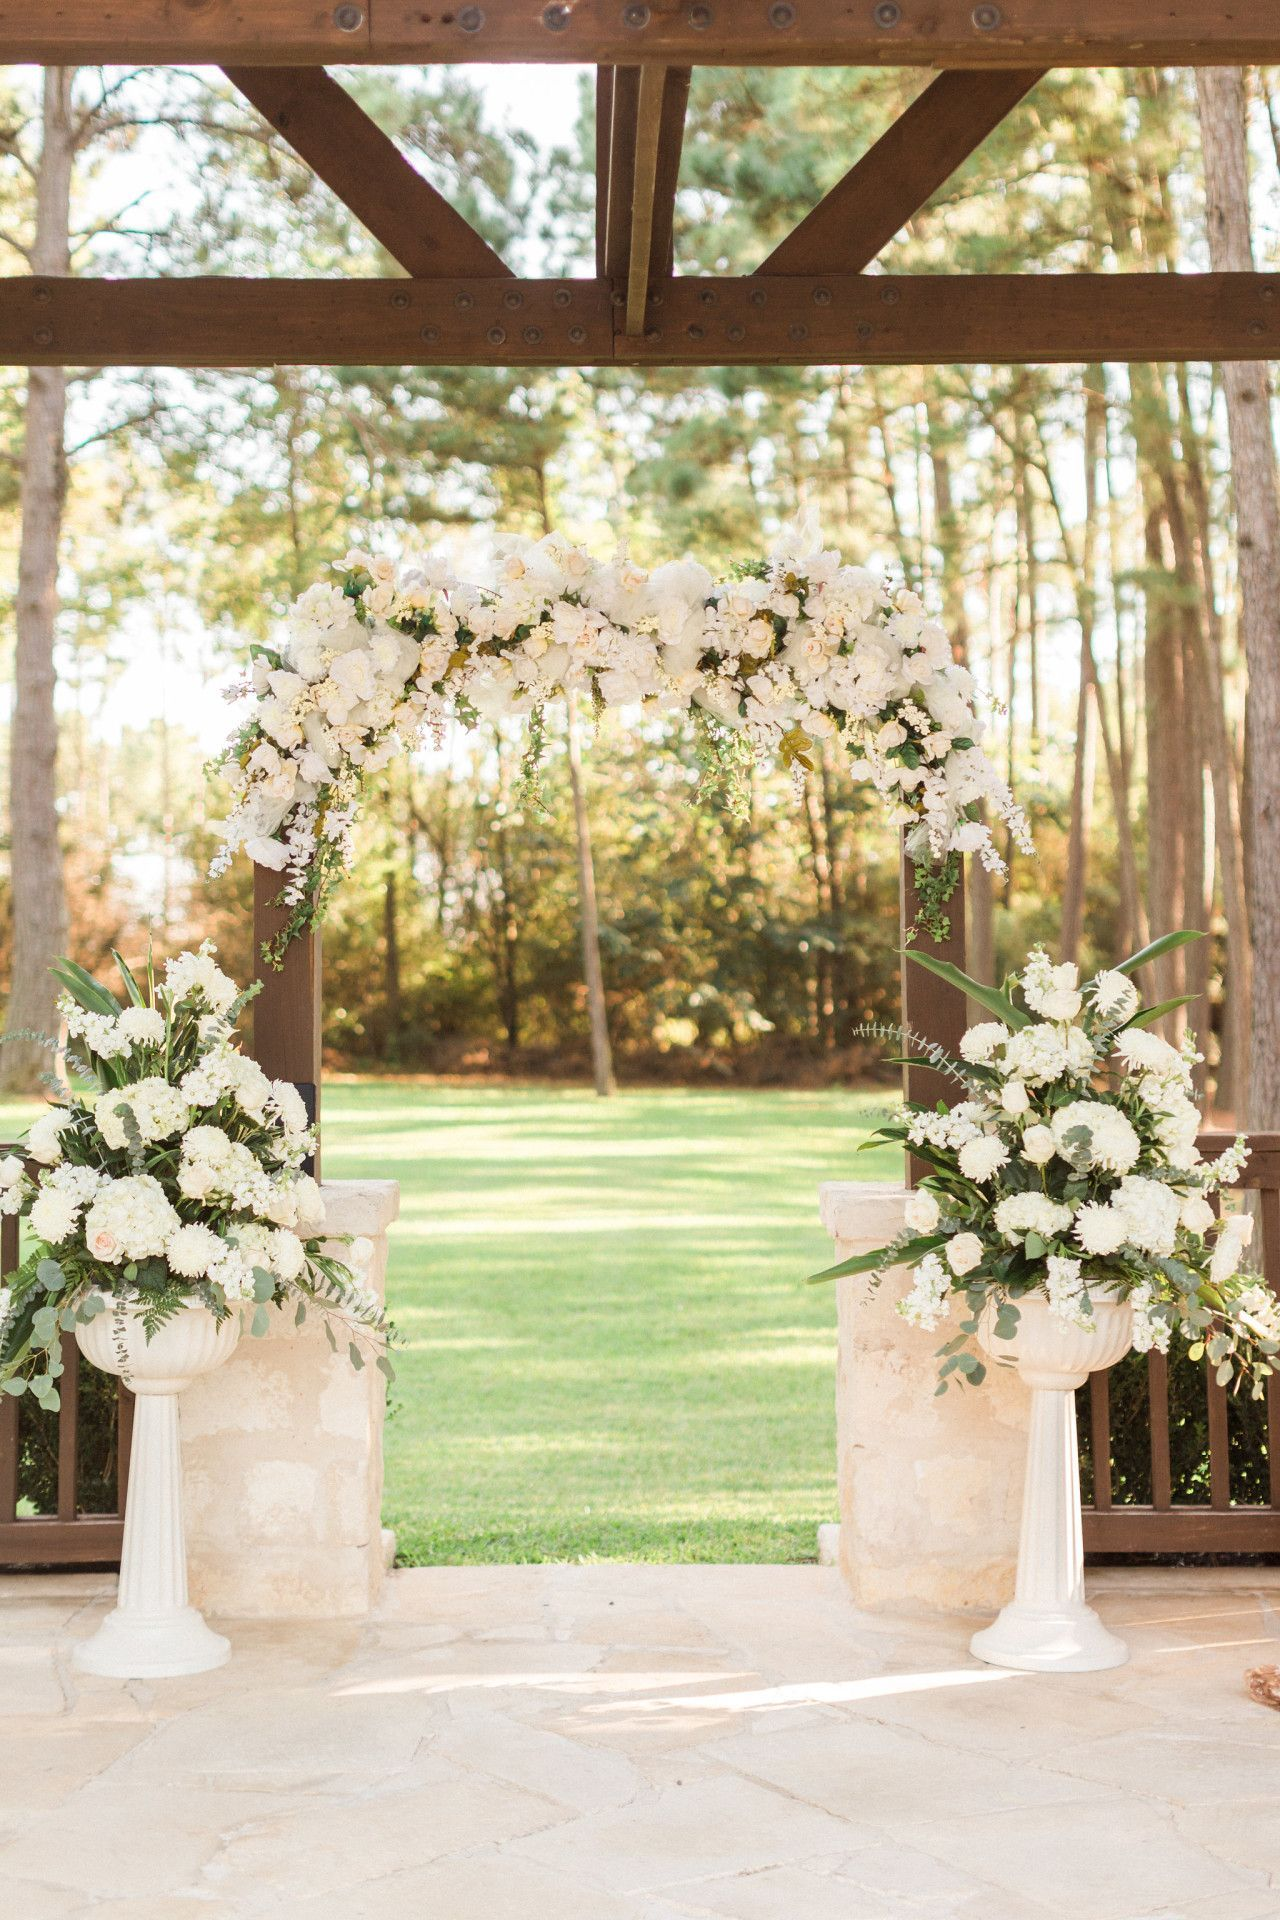 White wedding decoration ideas  blush pink  white wedding arch decor  elegant wedding arch